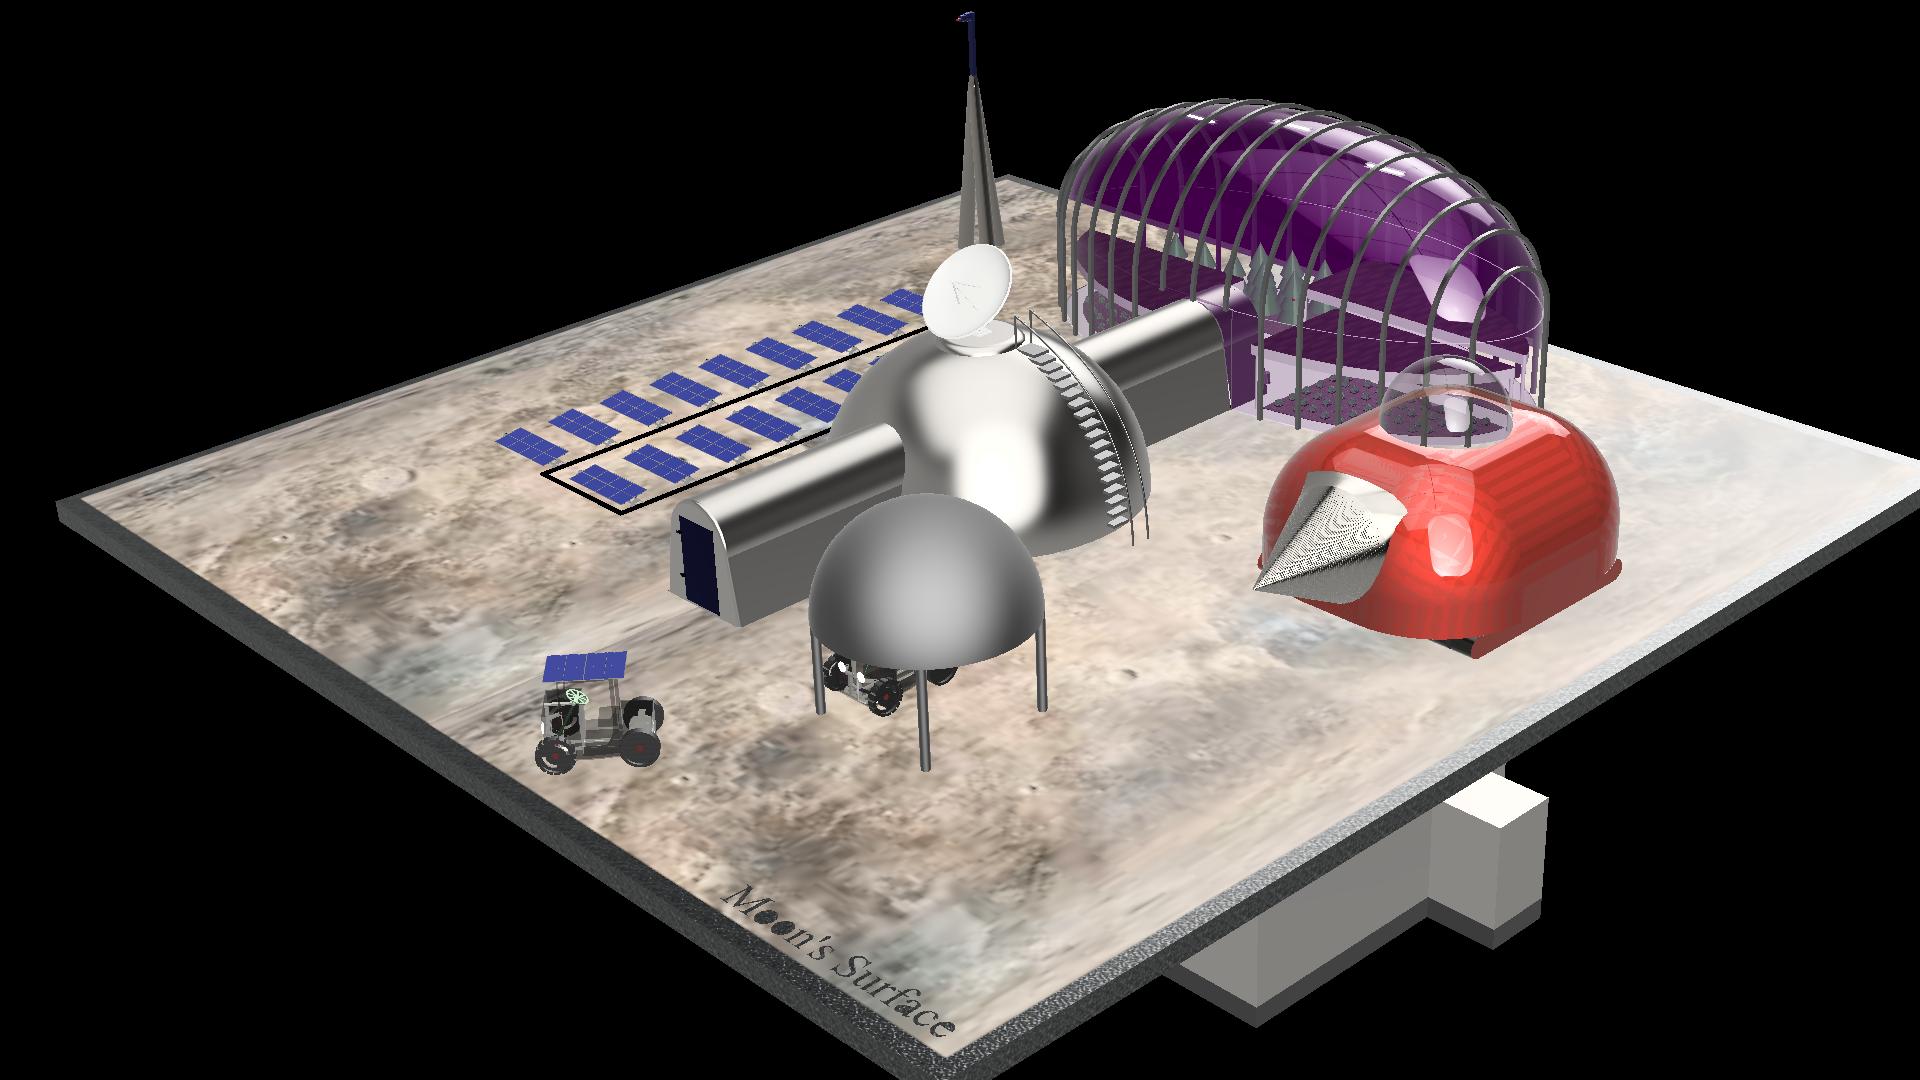 Lunar Base Design from Thessaloniki